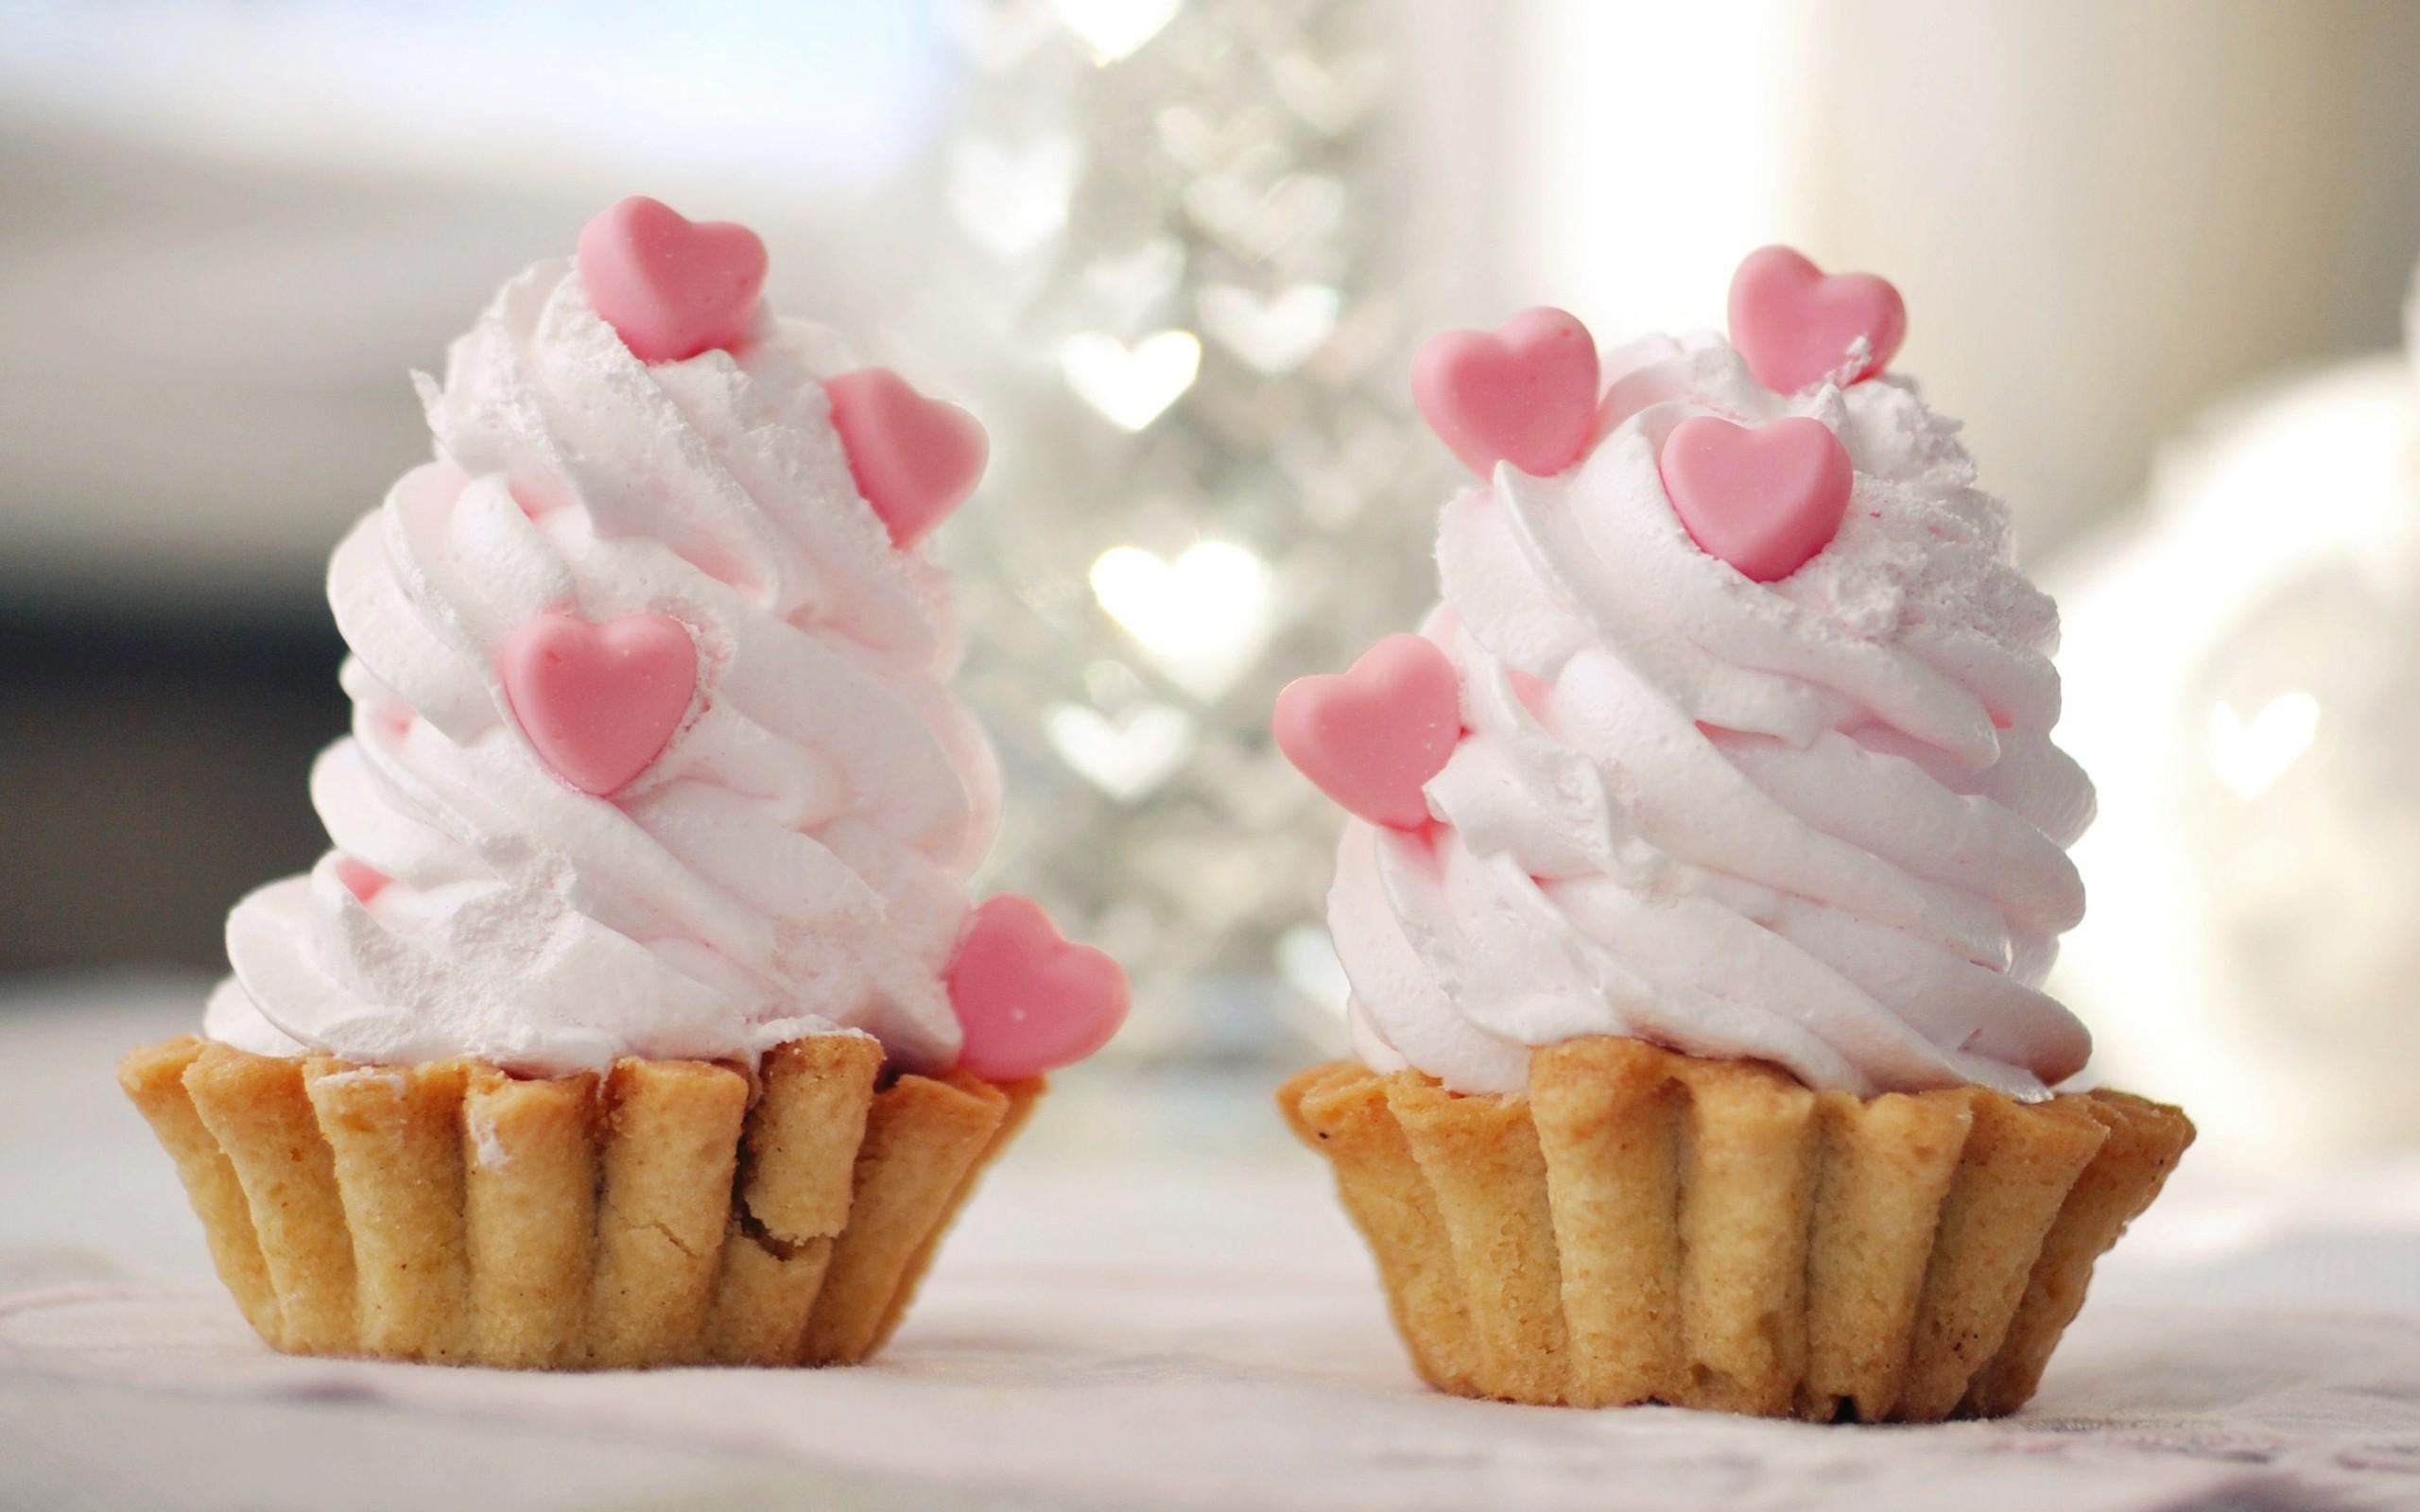 Cream heart cupcakes